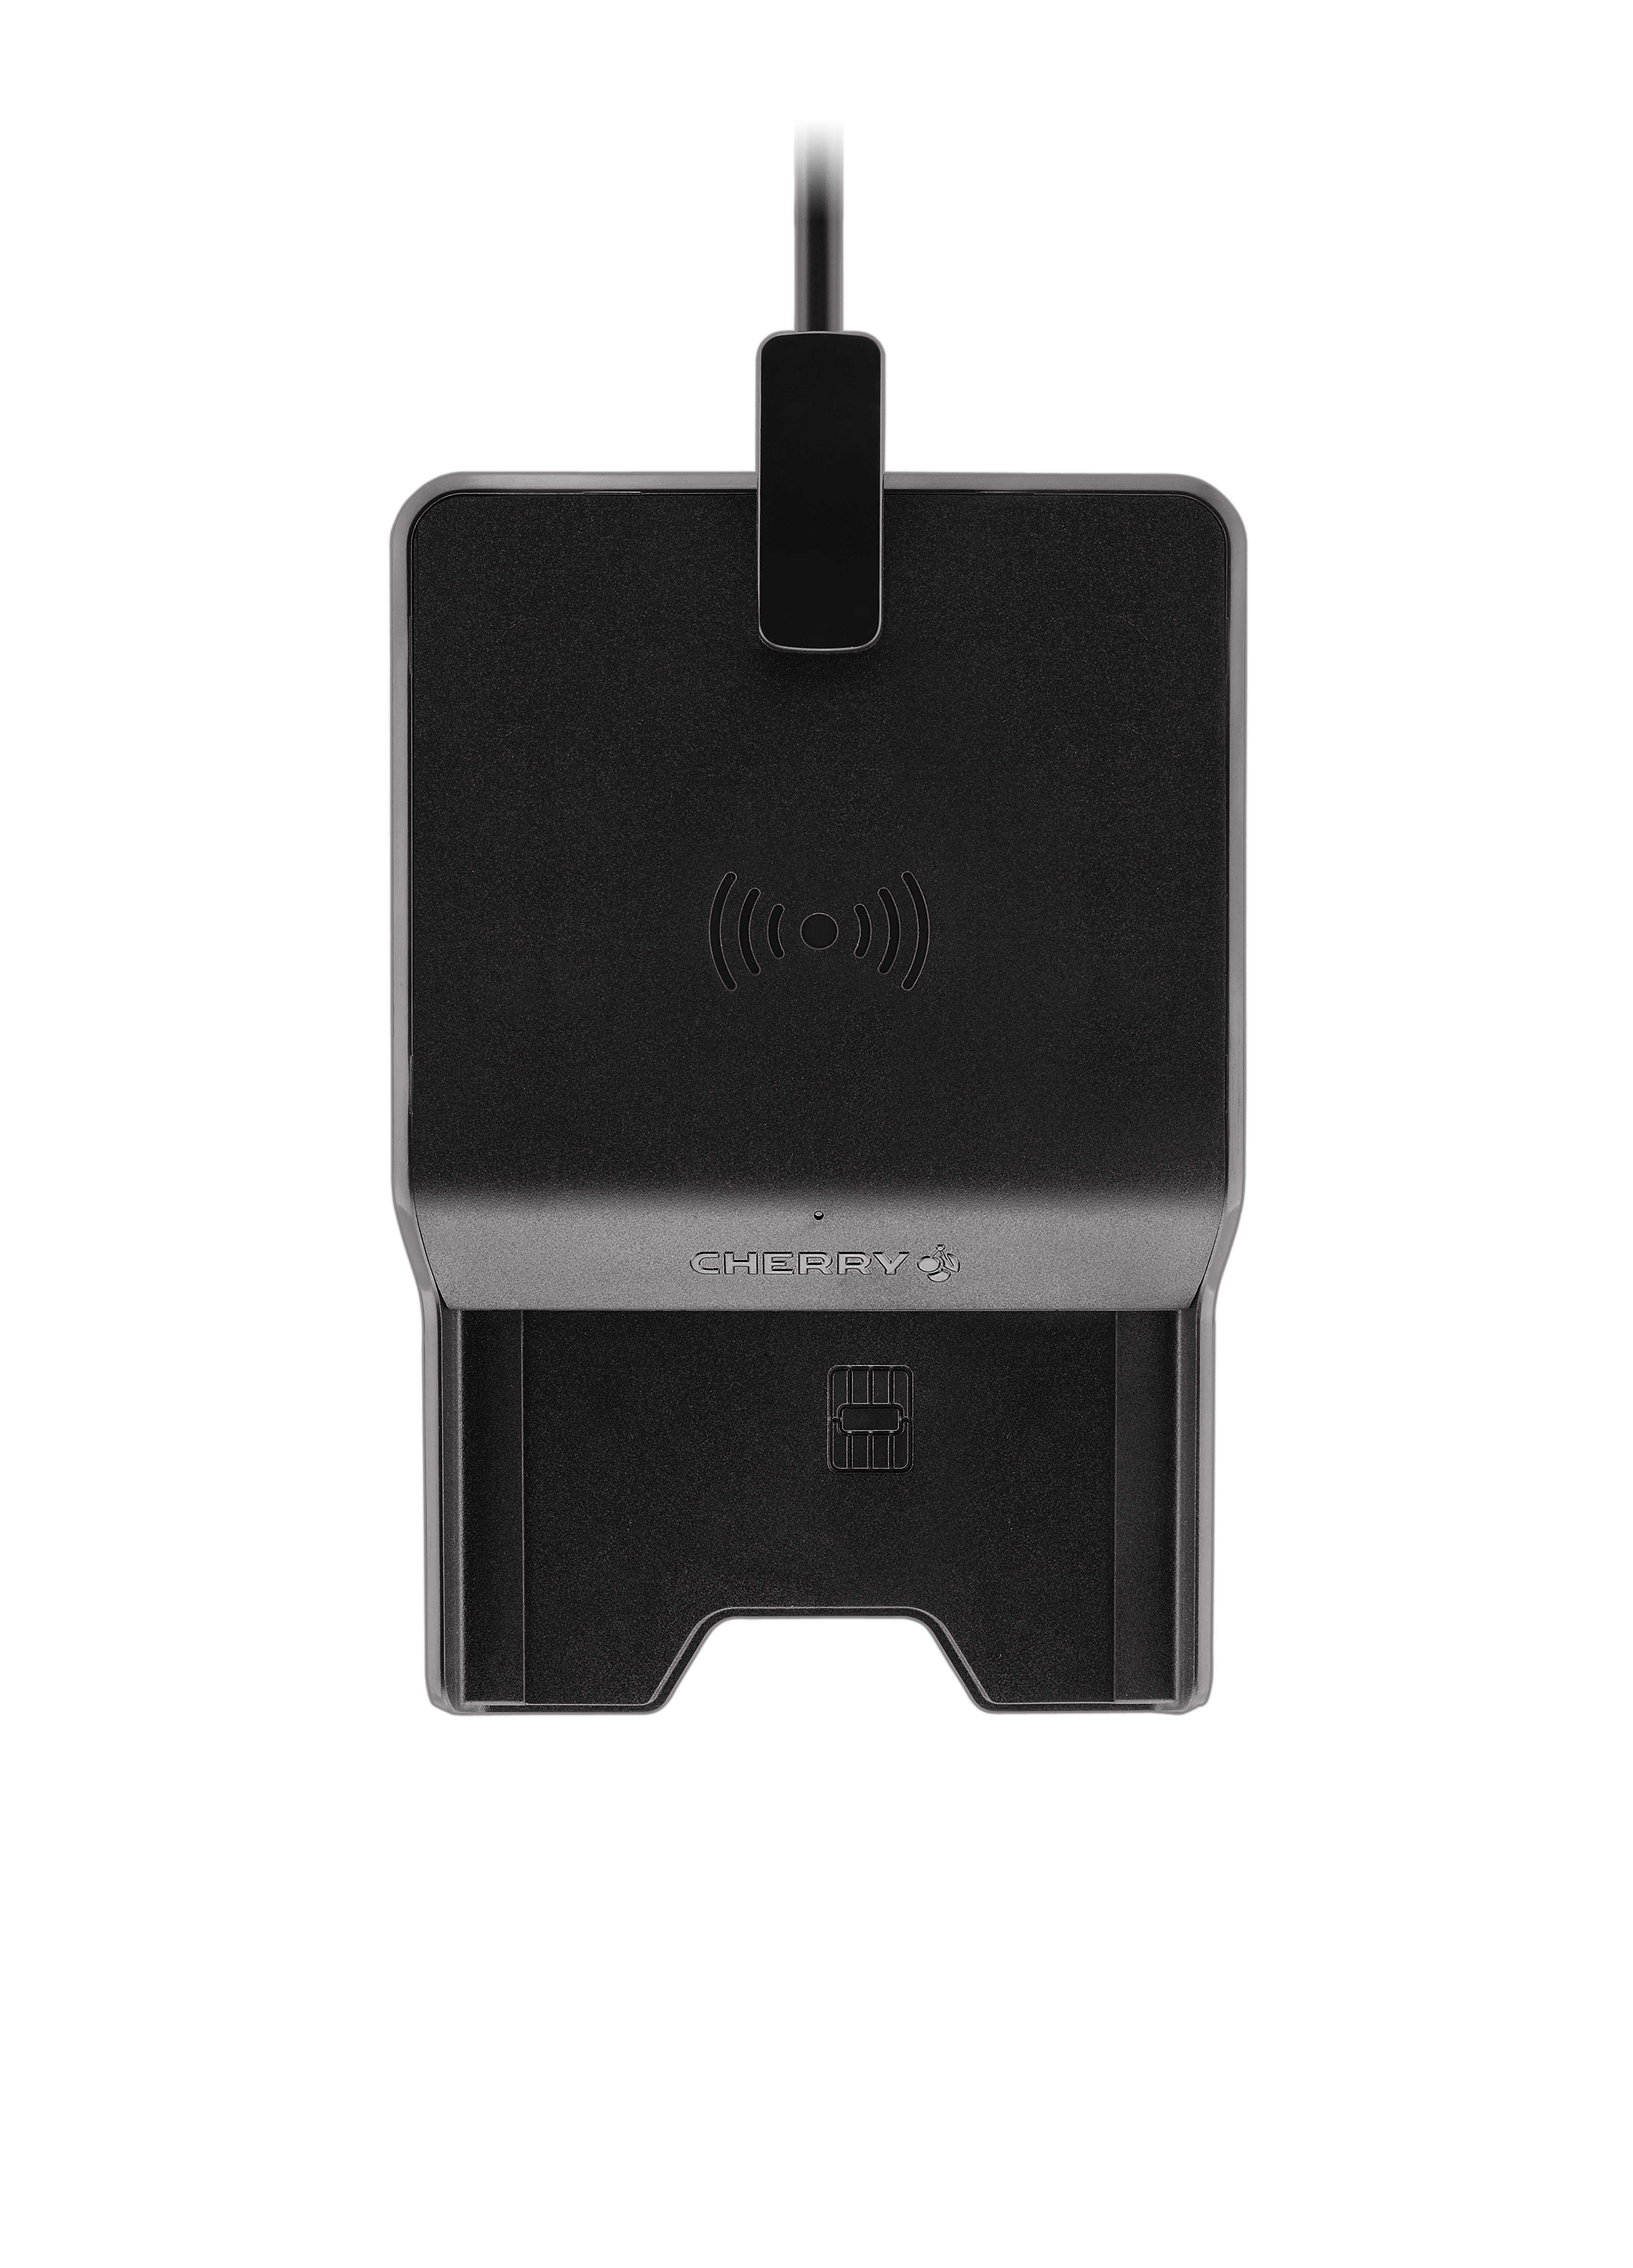 Cherry TC 1300 Innenraum USB 2.0 Schwarz Smart-Card-Lesegerät